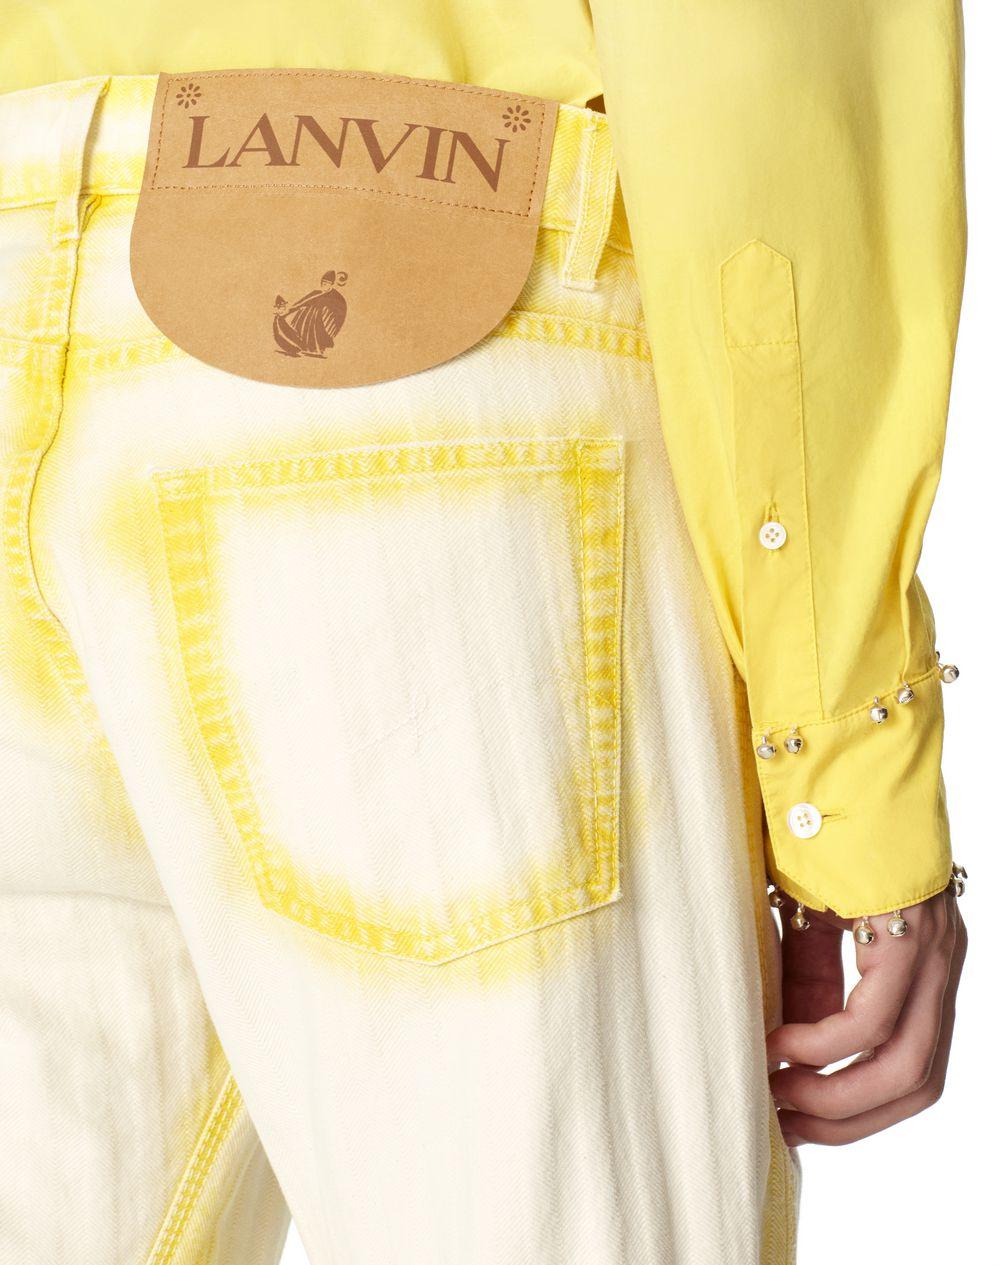 DENIM PANTS - Lanvin